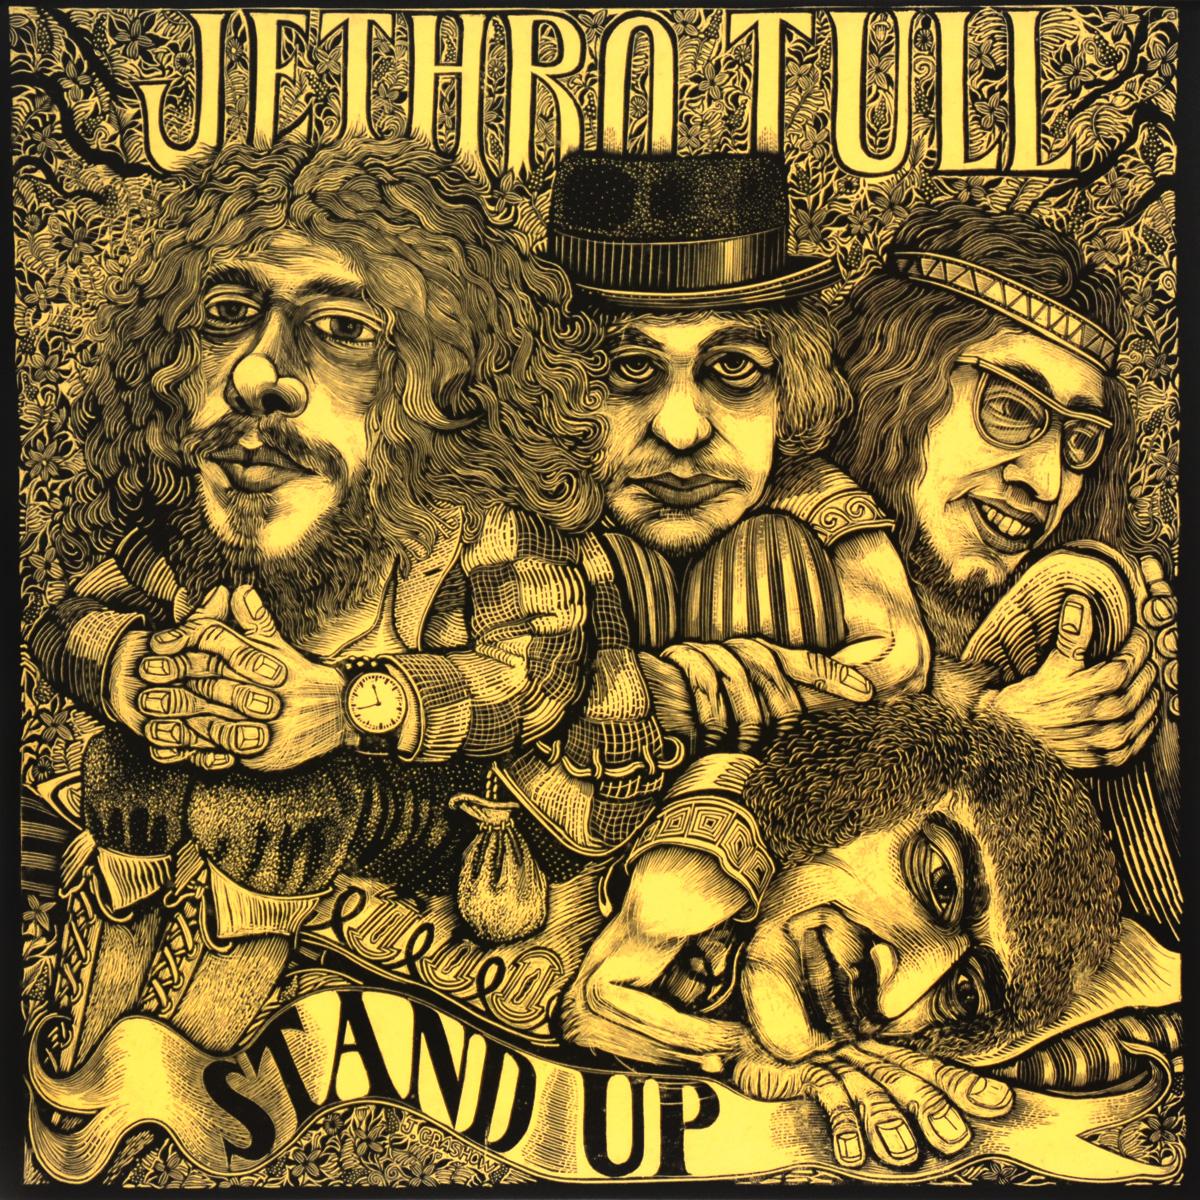 Jethro Tull Jethro Tull. Stand Up (LP) jethro tull jethro tull live at carnegie hall 1970 2 lp